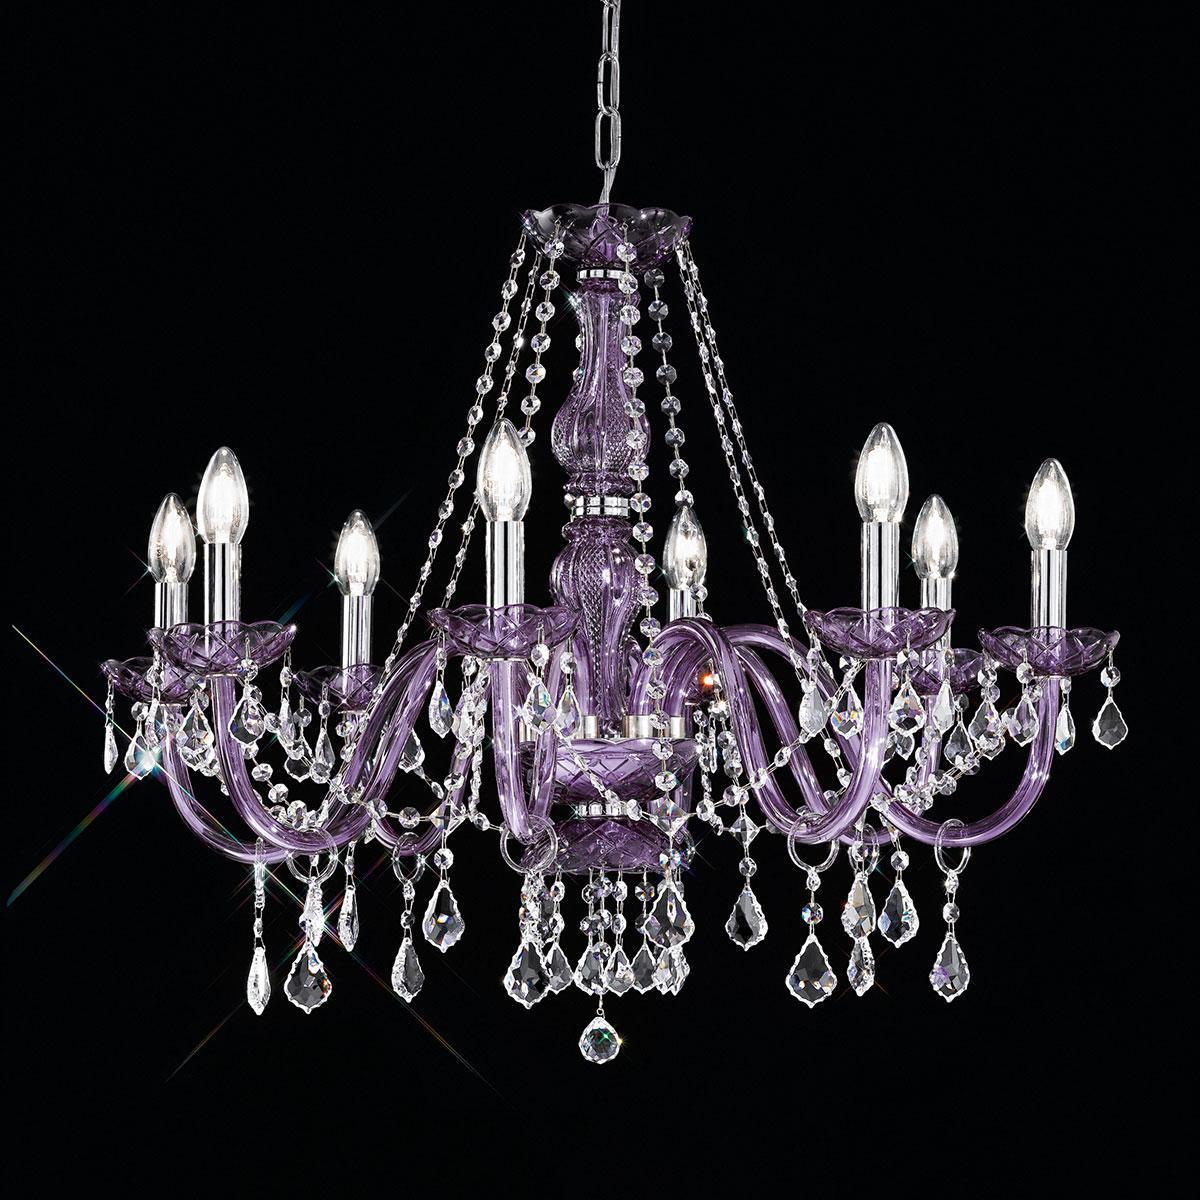 """Brindisi"" lampara veneciana en cristal - 8 luce - purpura"